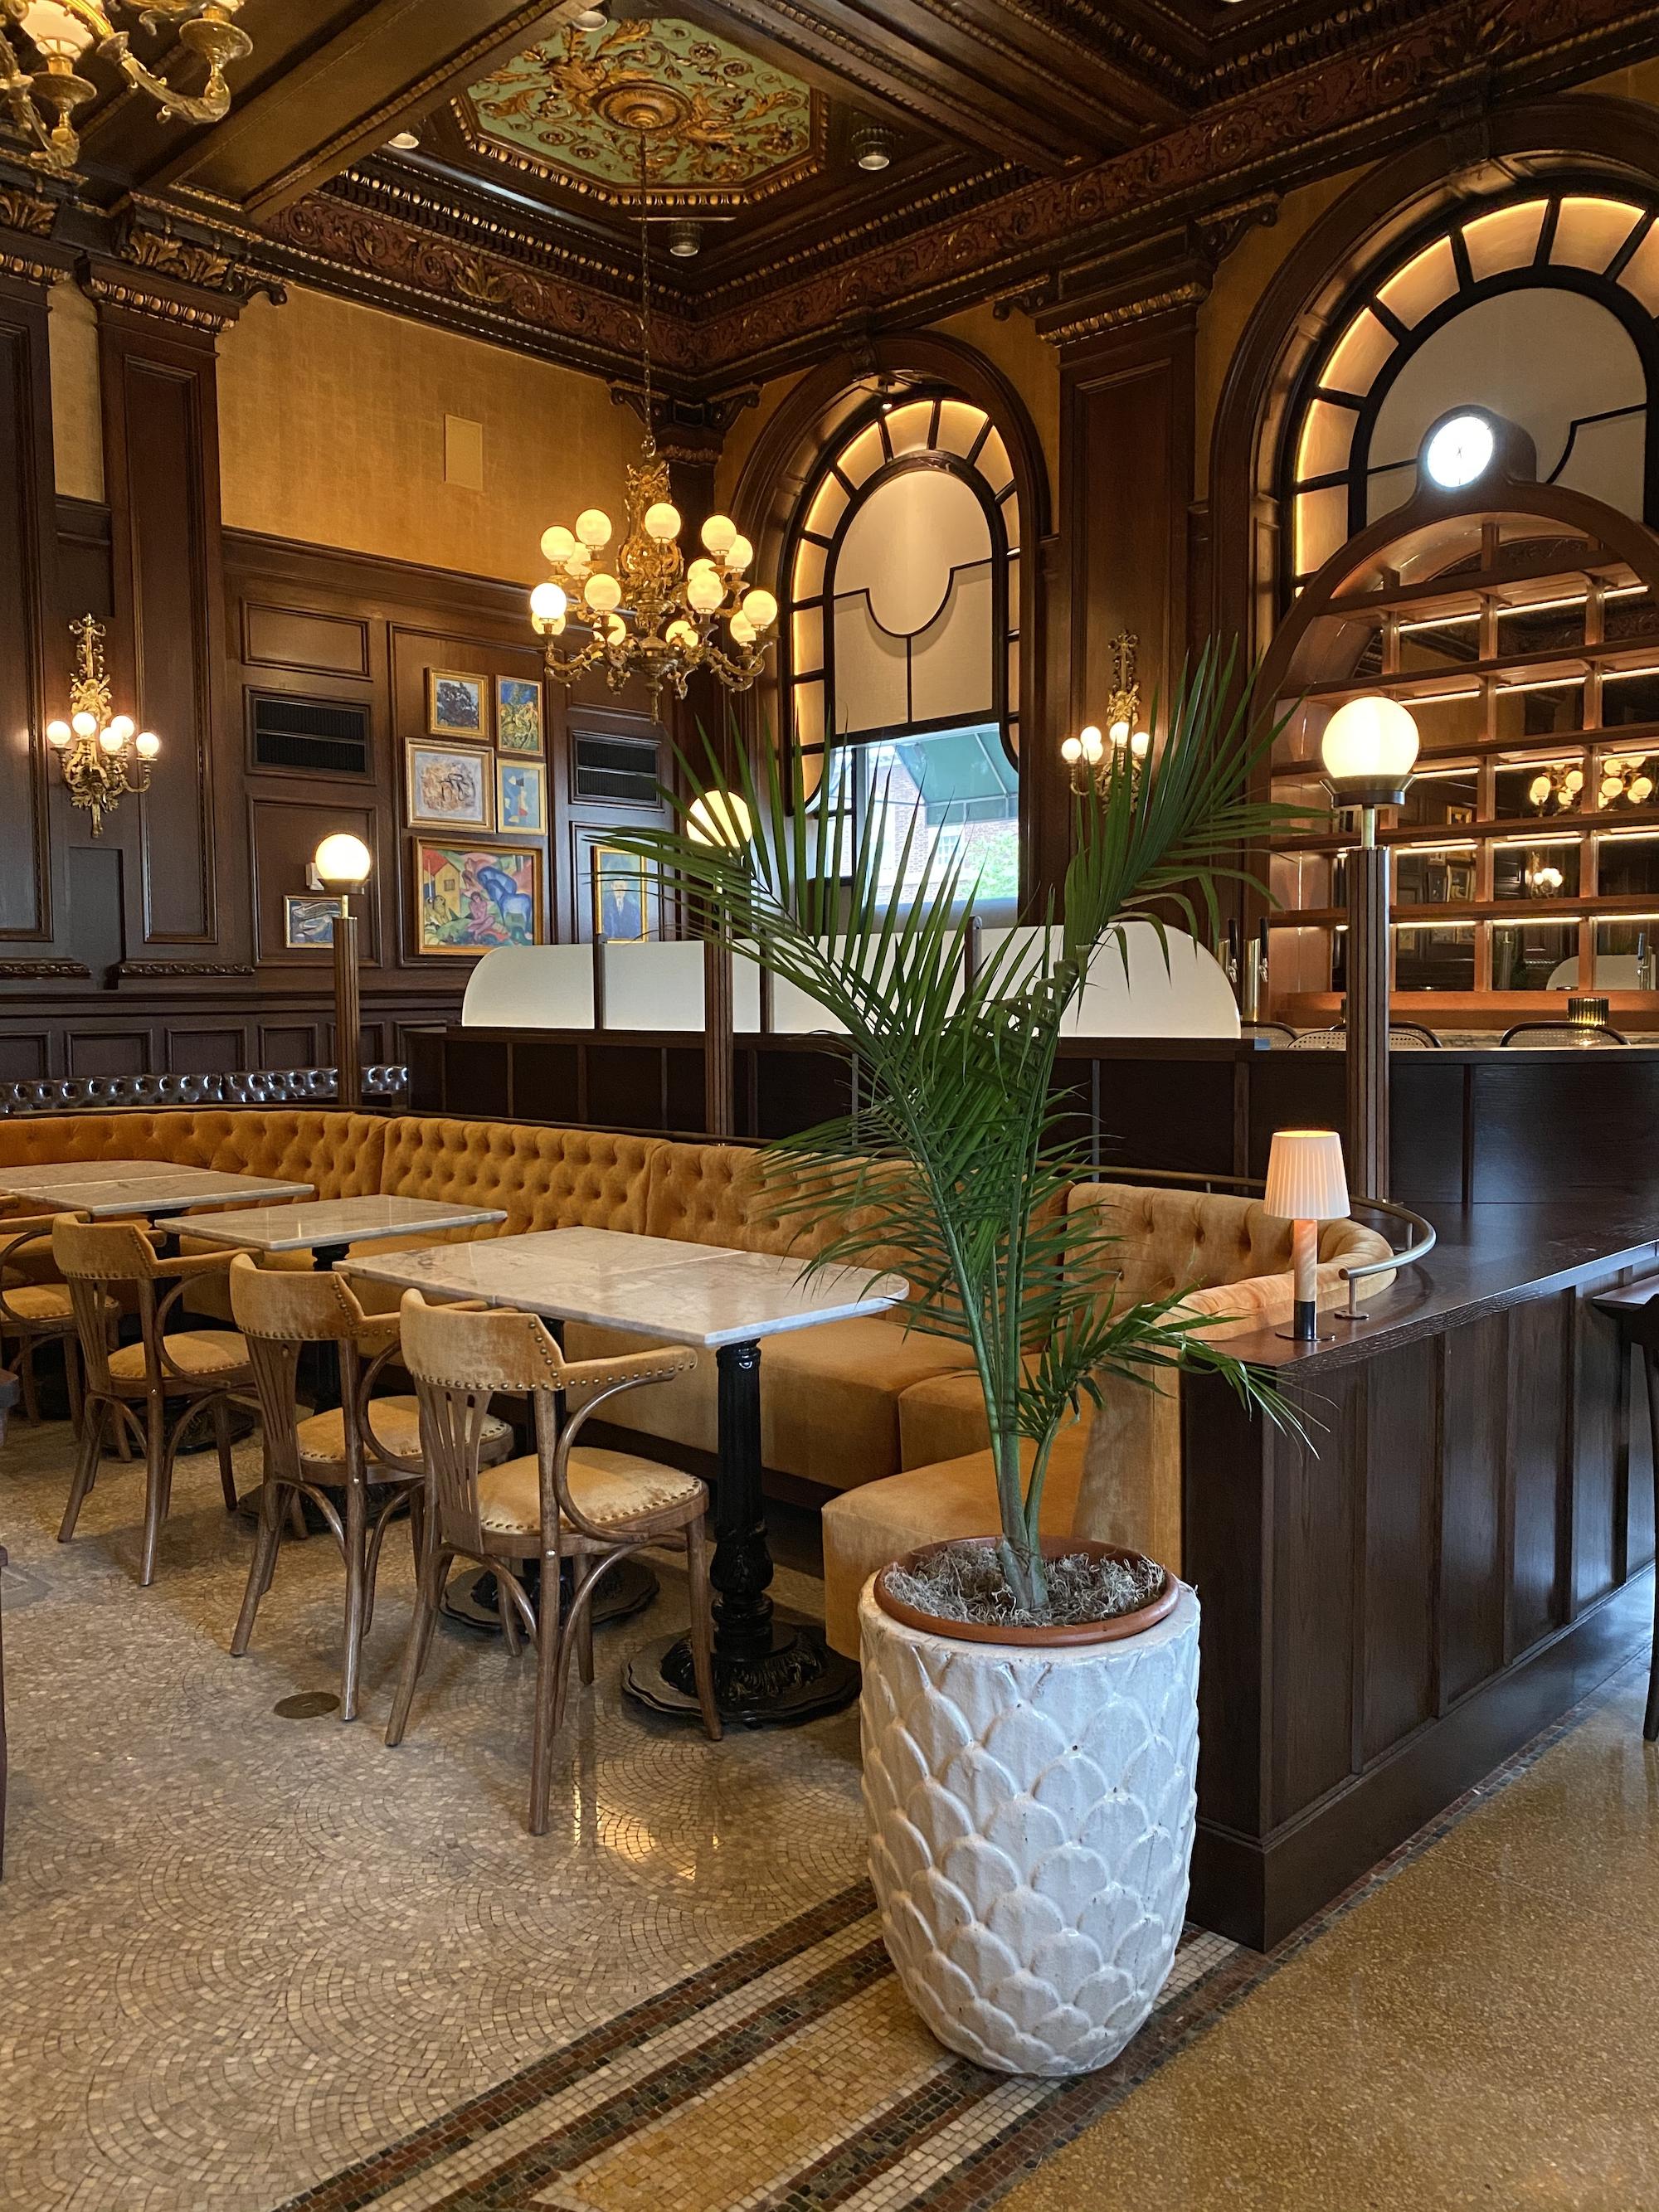 LeCav restaurant at Wilmington's Hotel DuPont